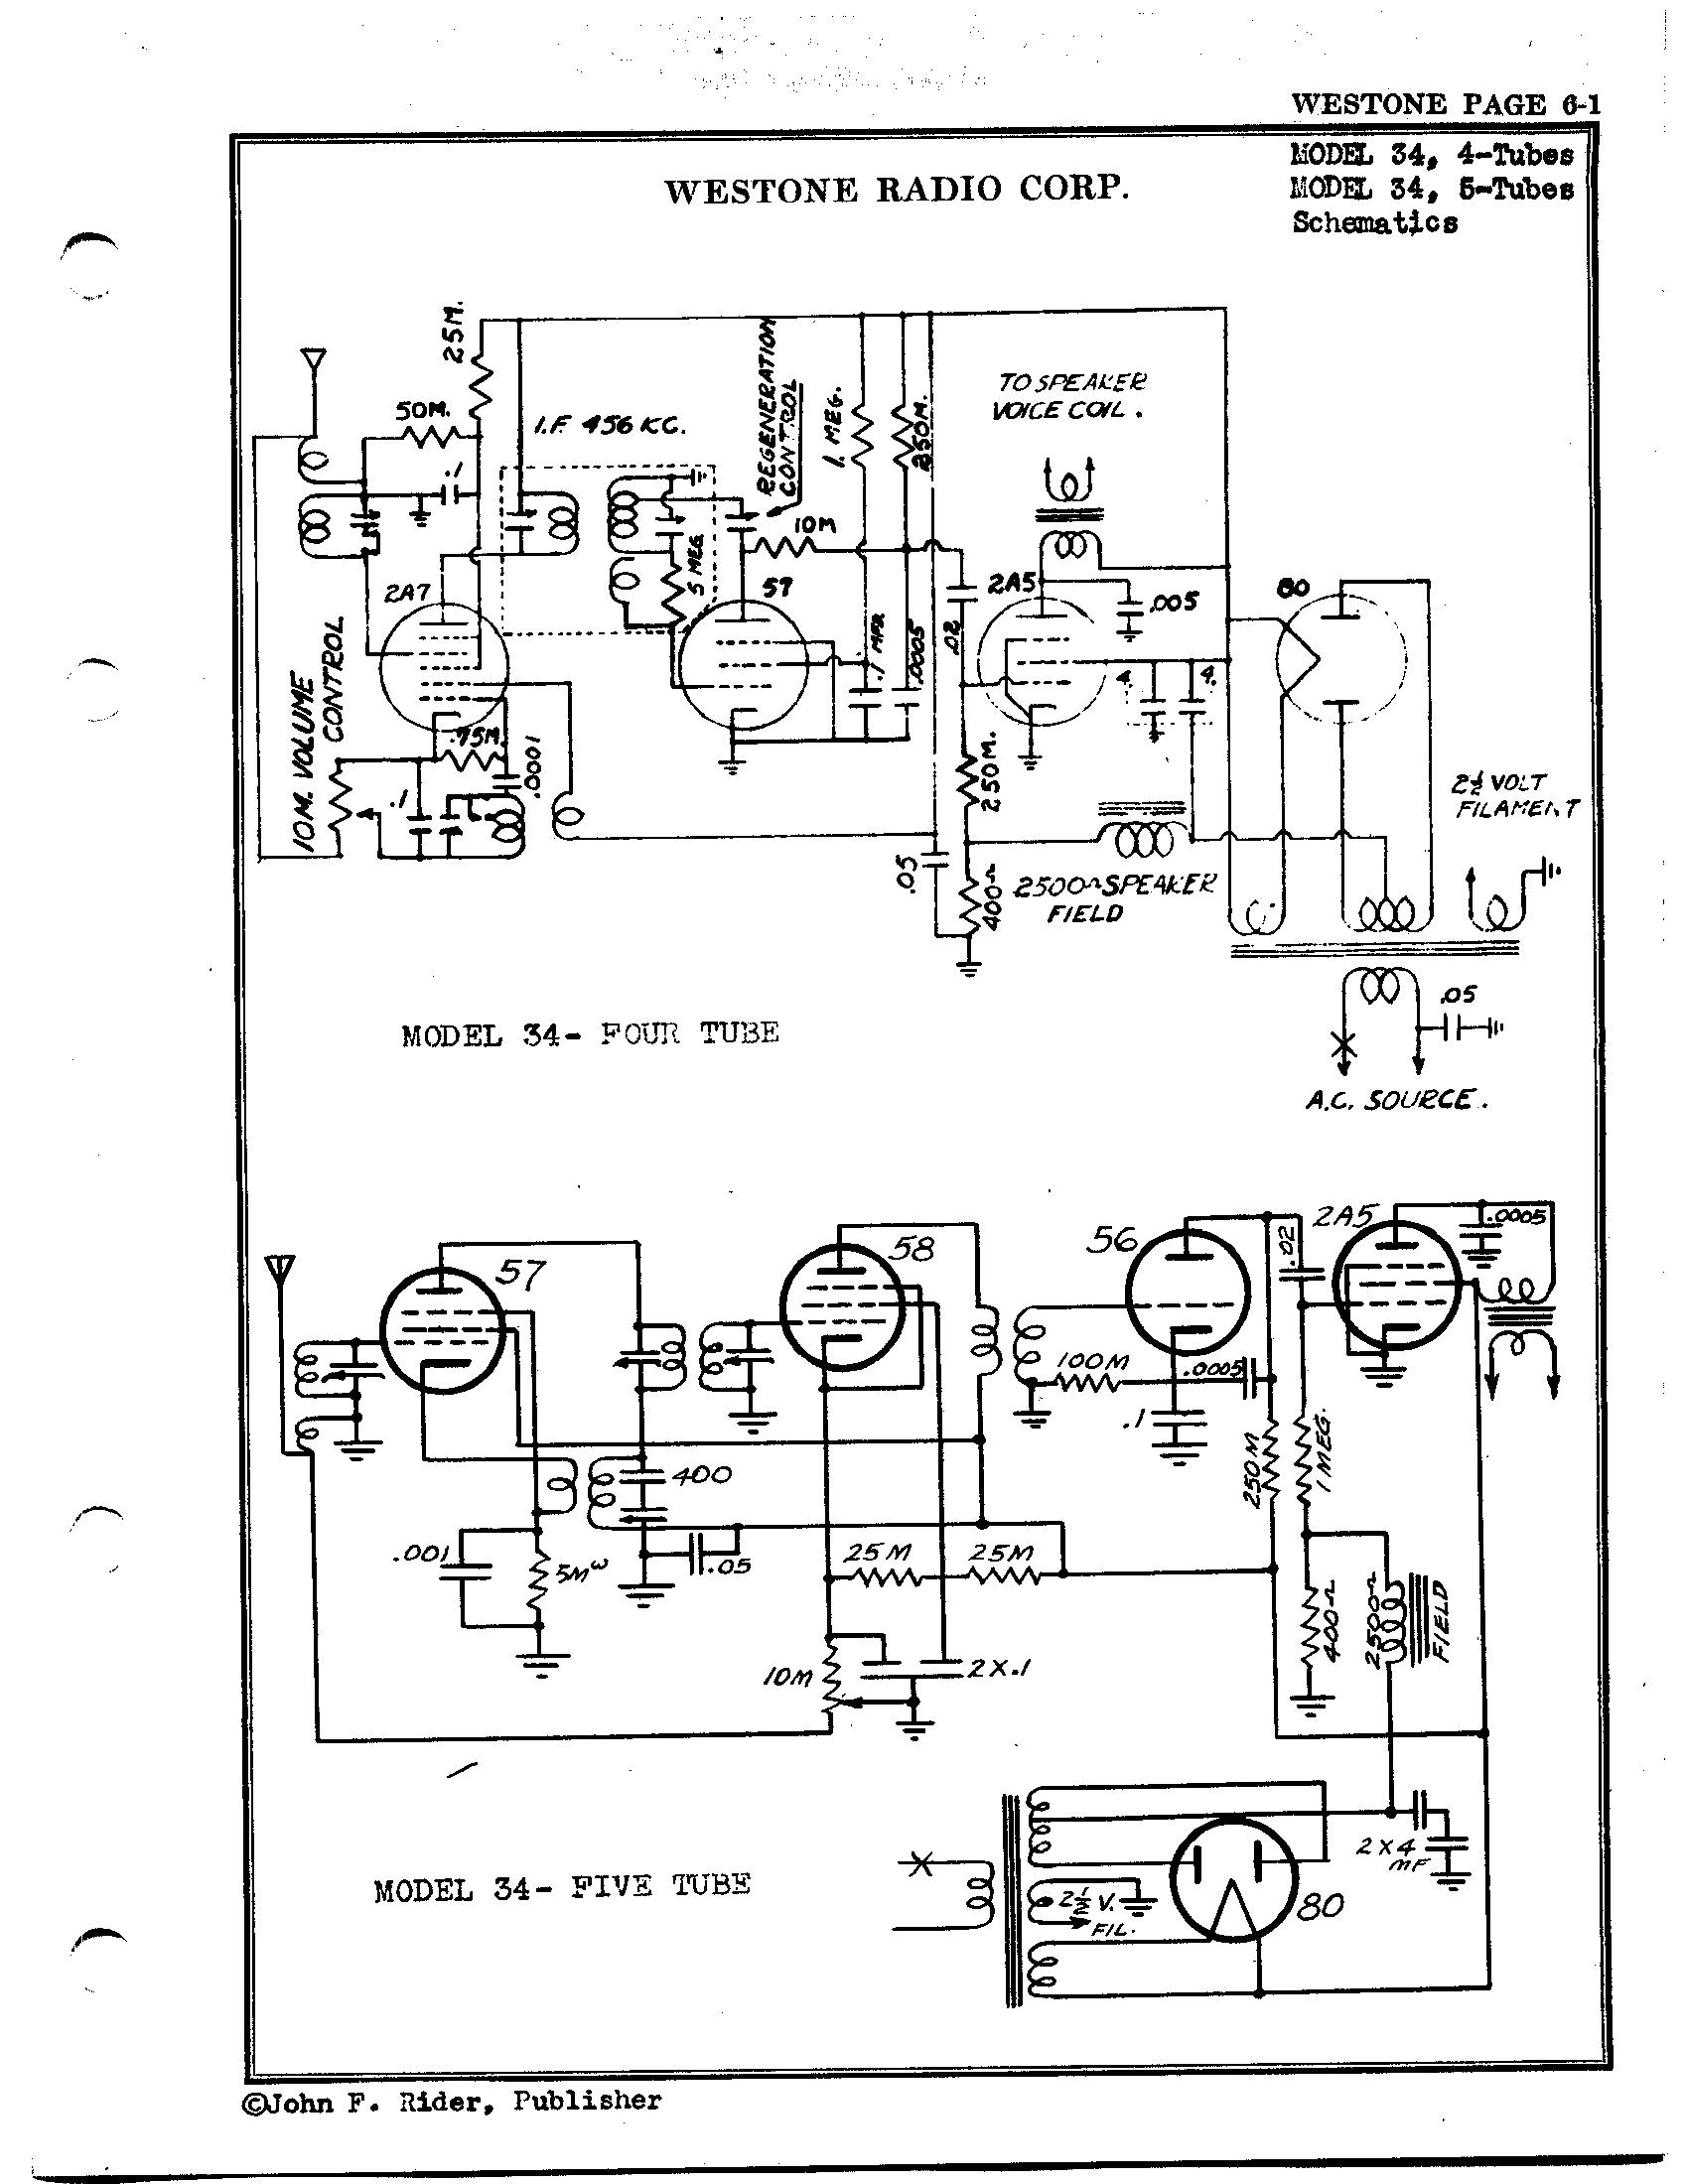 5 Tube Am Radio Schematic Diagram    Wiring Diagram